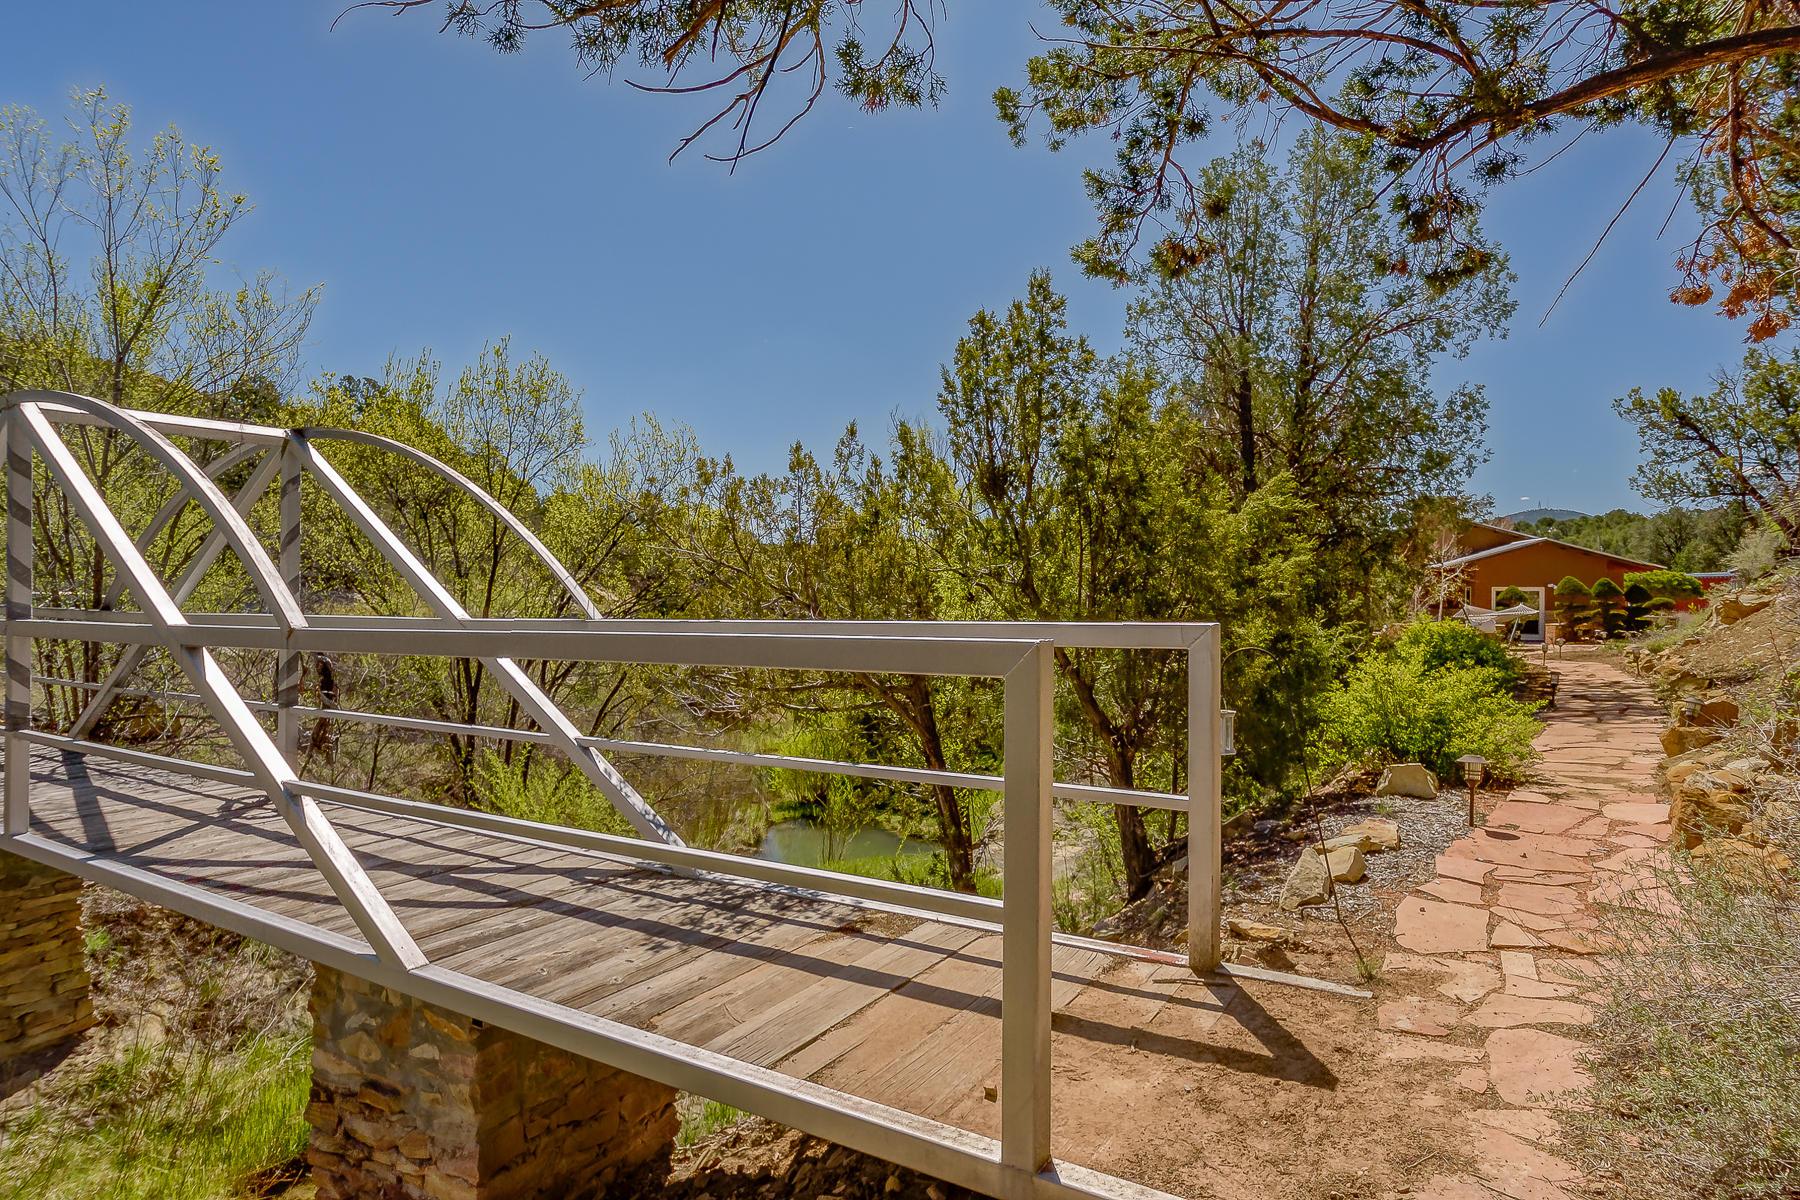 Bridge on Neighboring Lot